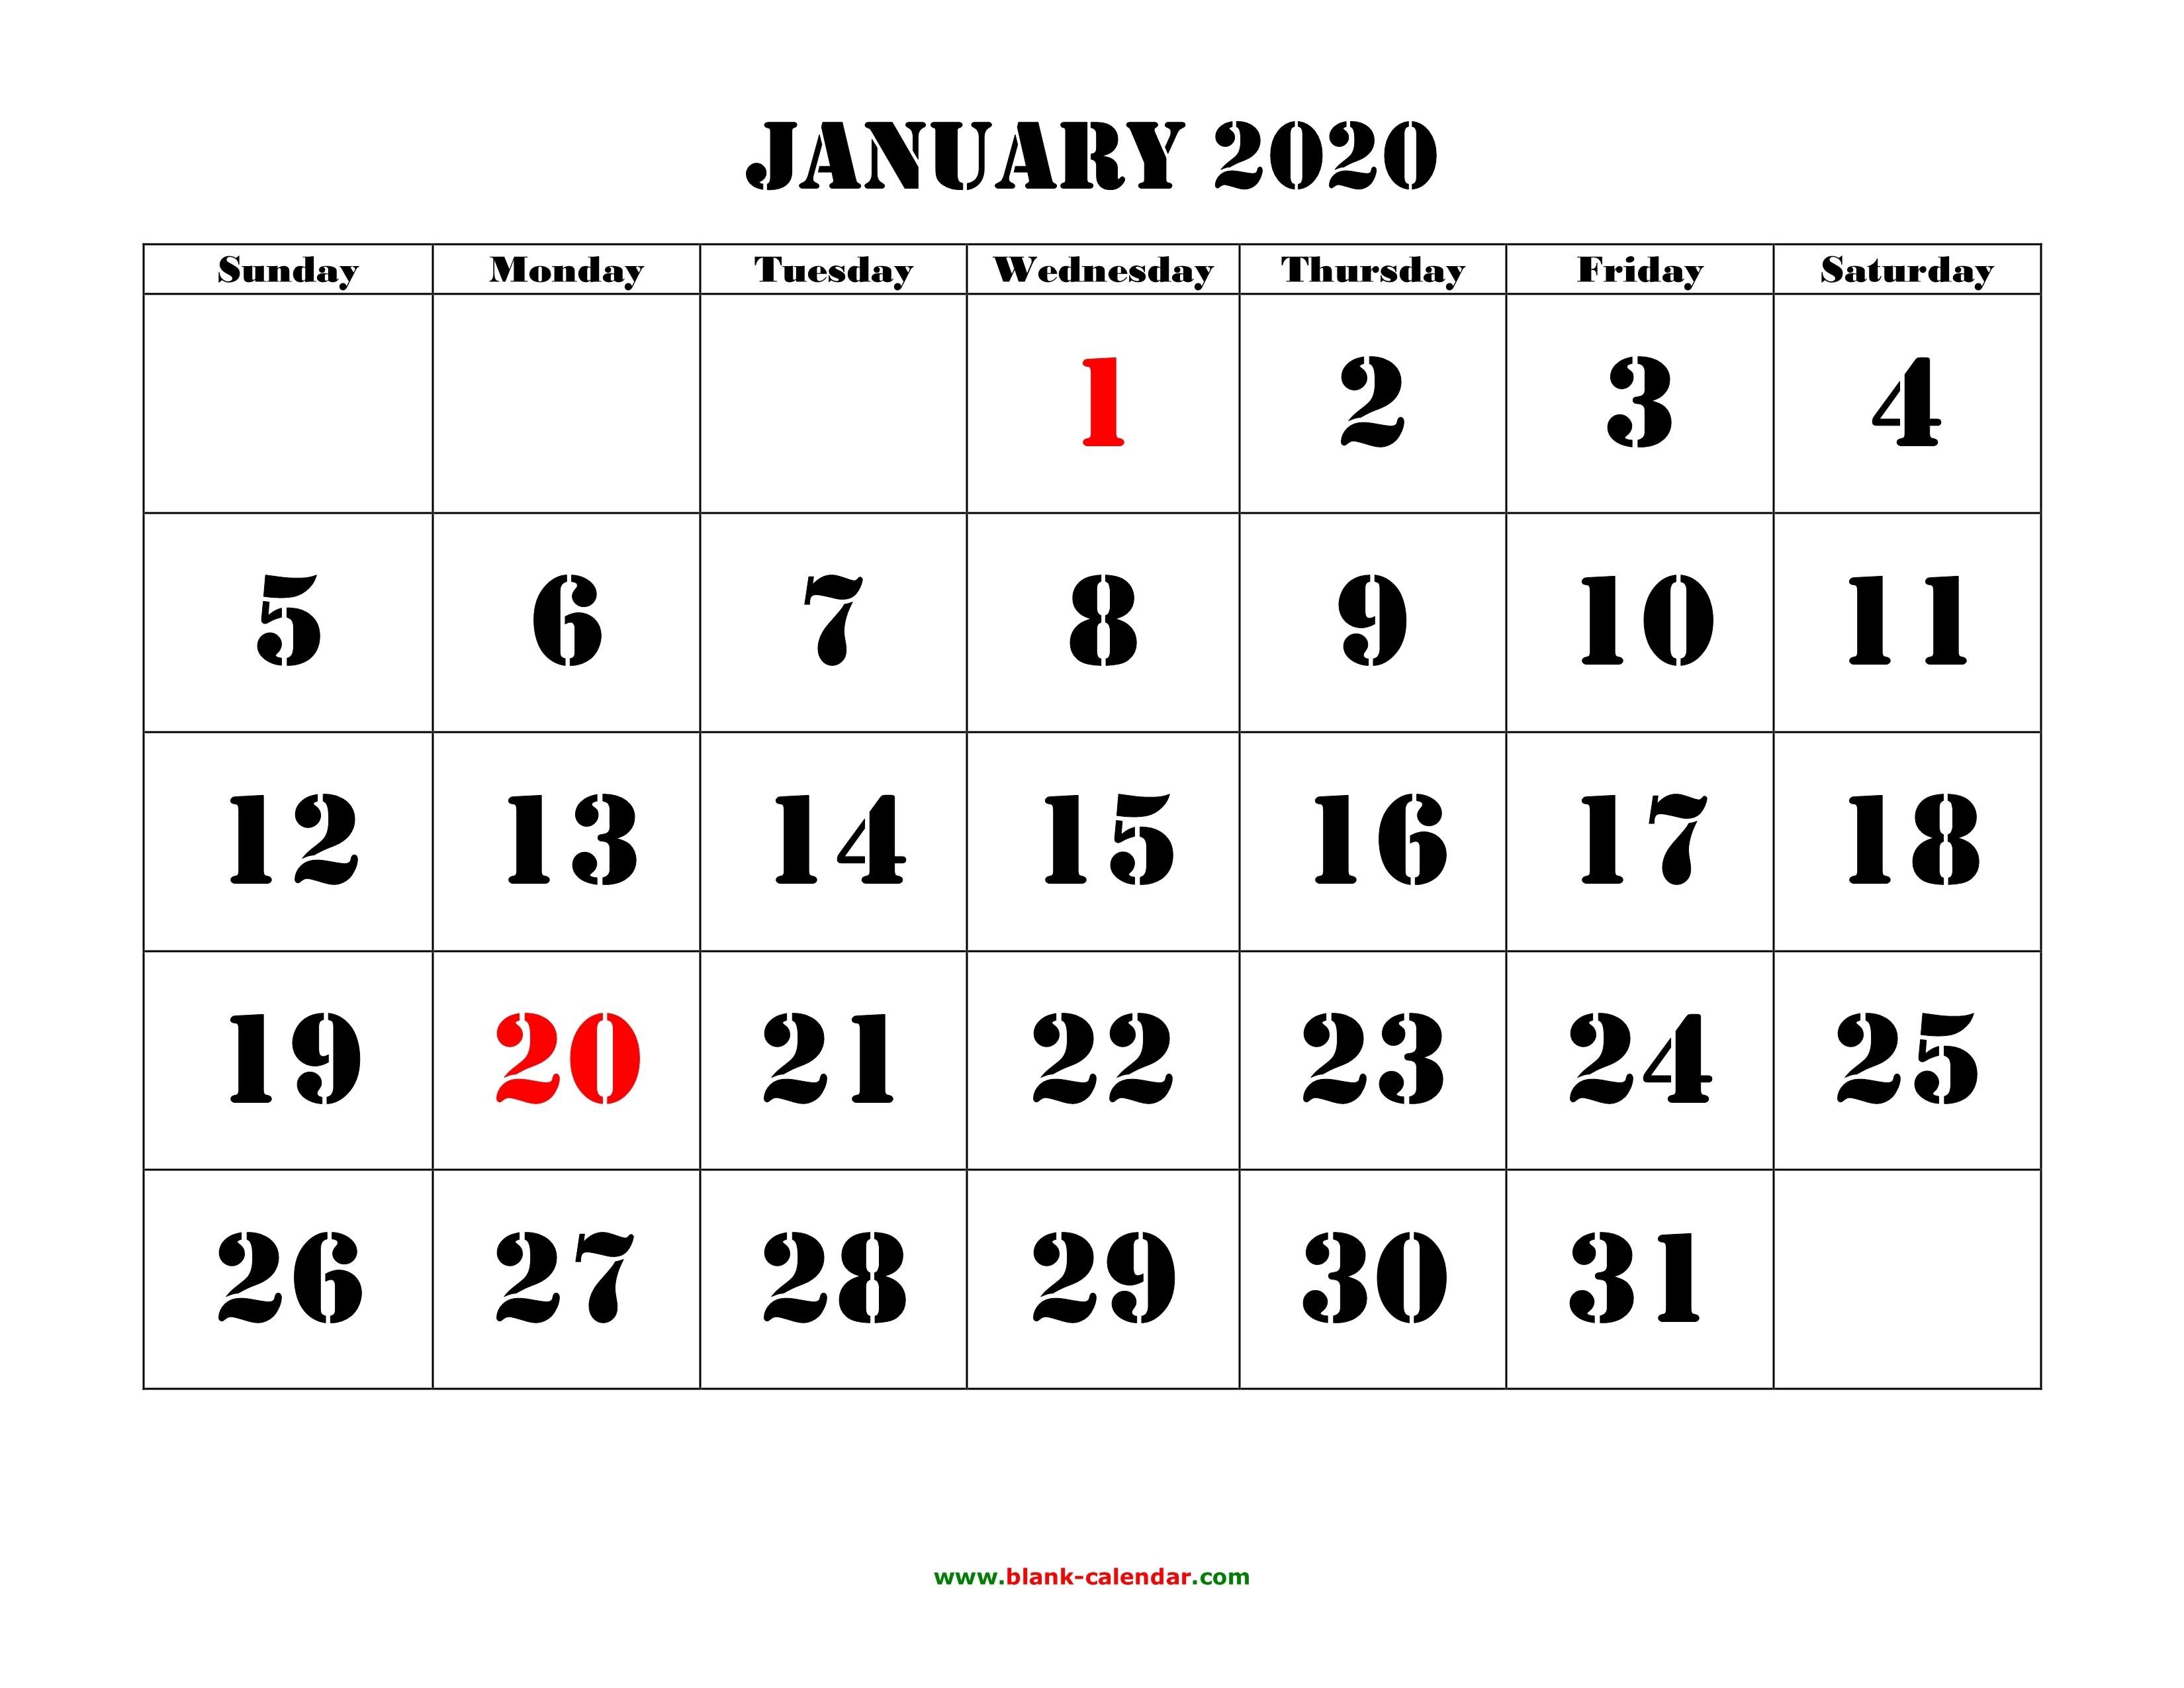 Printable January 2020 Calendar - Free Blank Templates-January 2020 Calendar Holidays